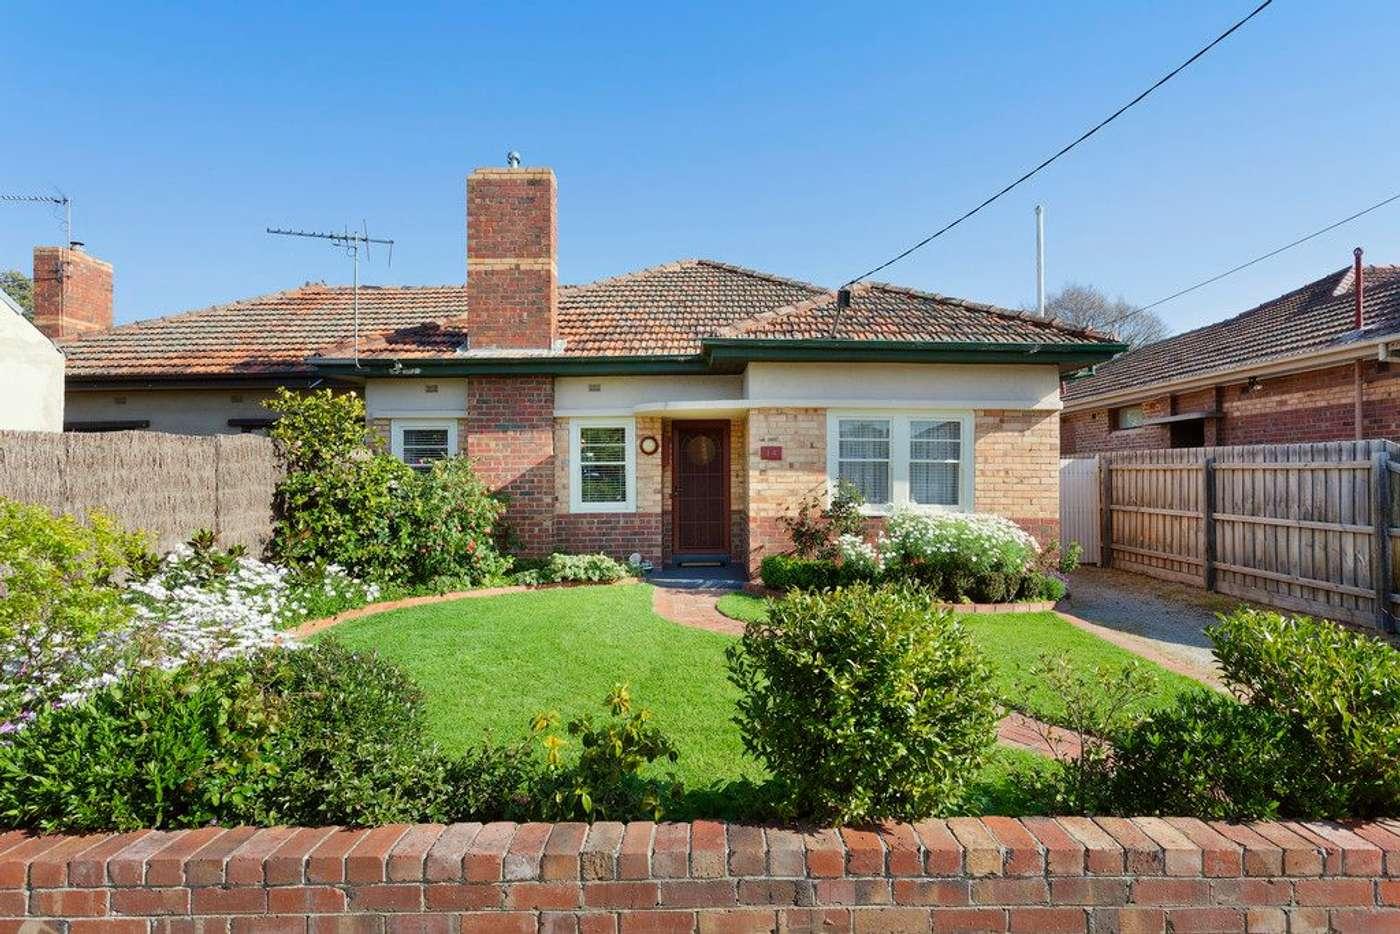 Main view of Homely house listing, 14 Kangaroo Road, Murrumbeena VIC 3163